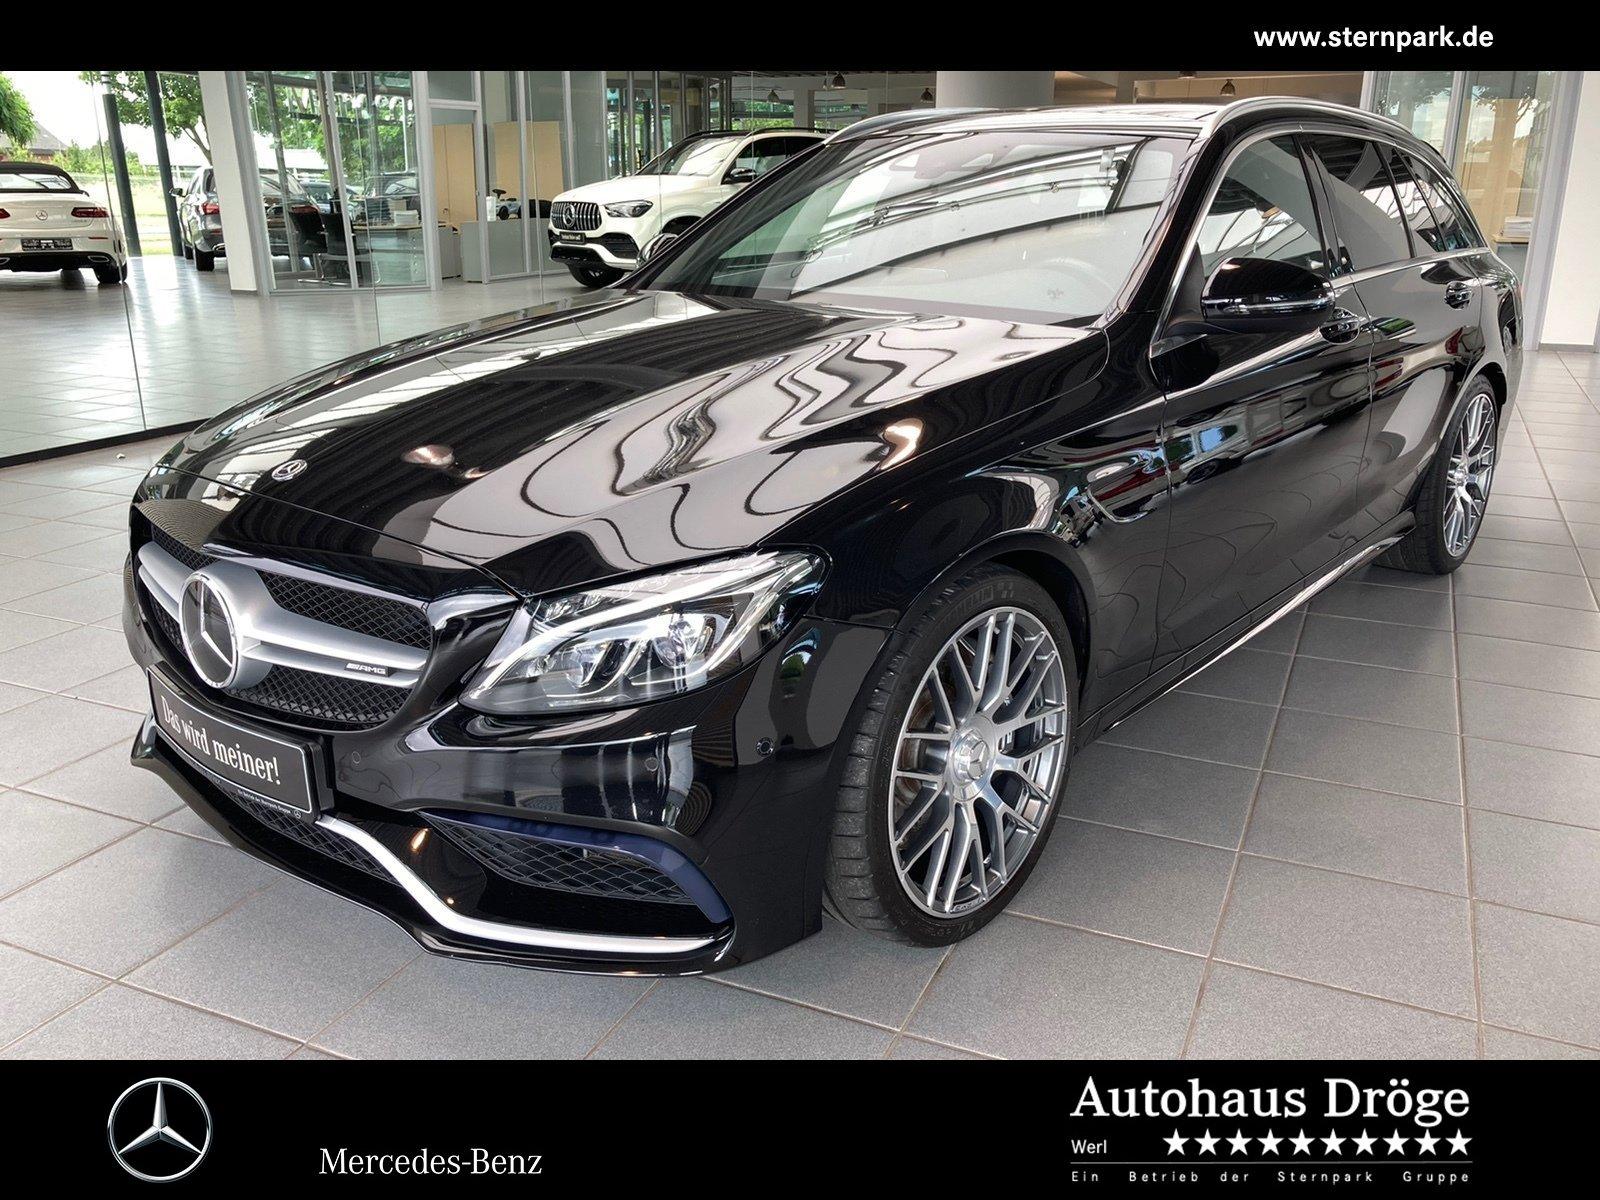 Mercedes-Benz C 63 T AMG Comand*Pano*Memory*Distro*Kamera*LED, Jahr 2018, Benzin